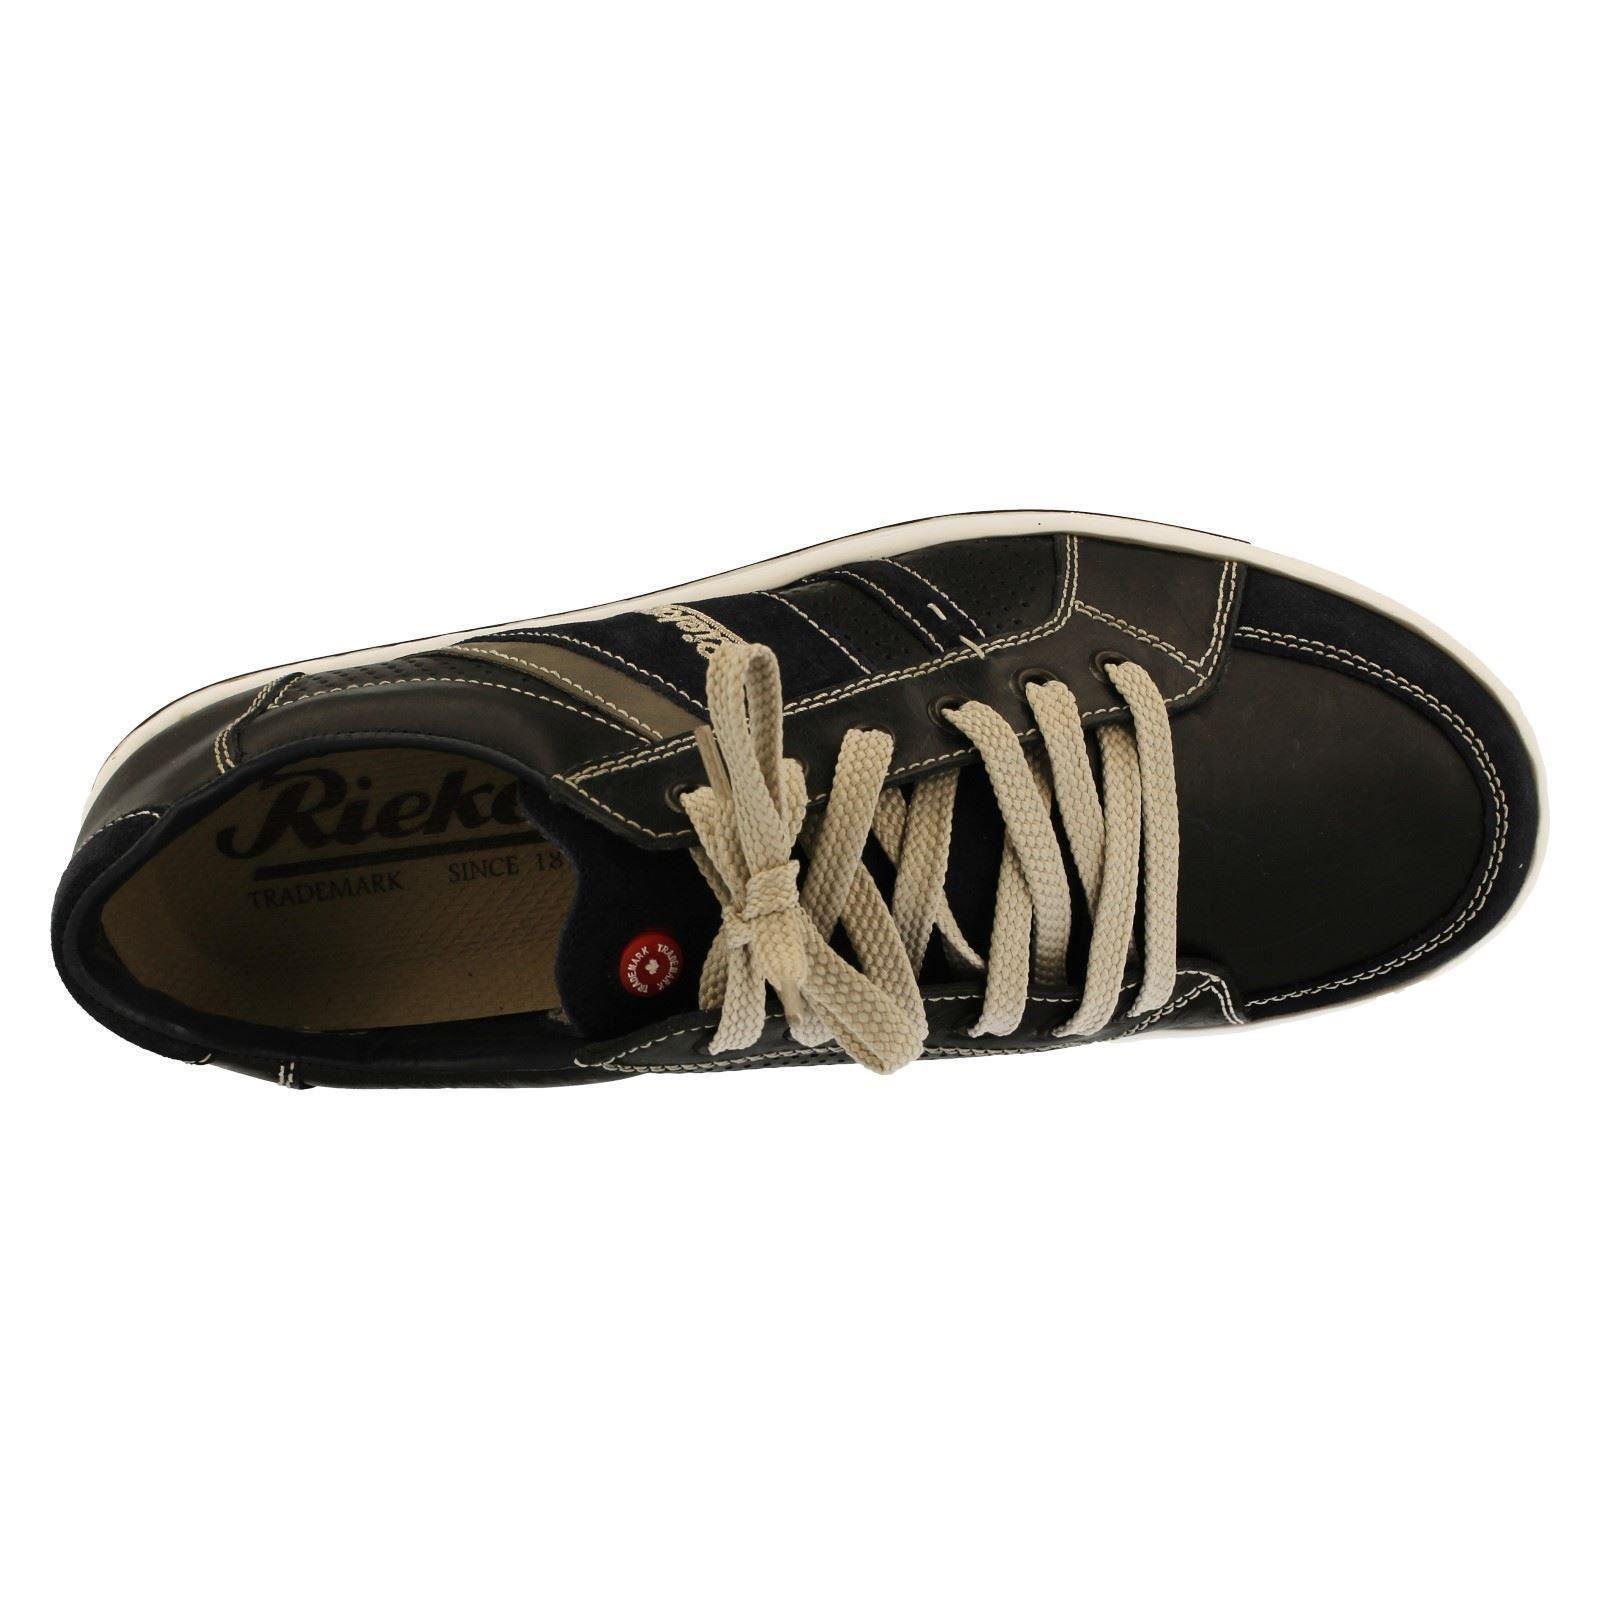 19016-W  Herren Rieker Schuhes The Style 19016-W  b97c80